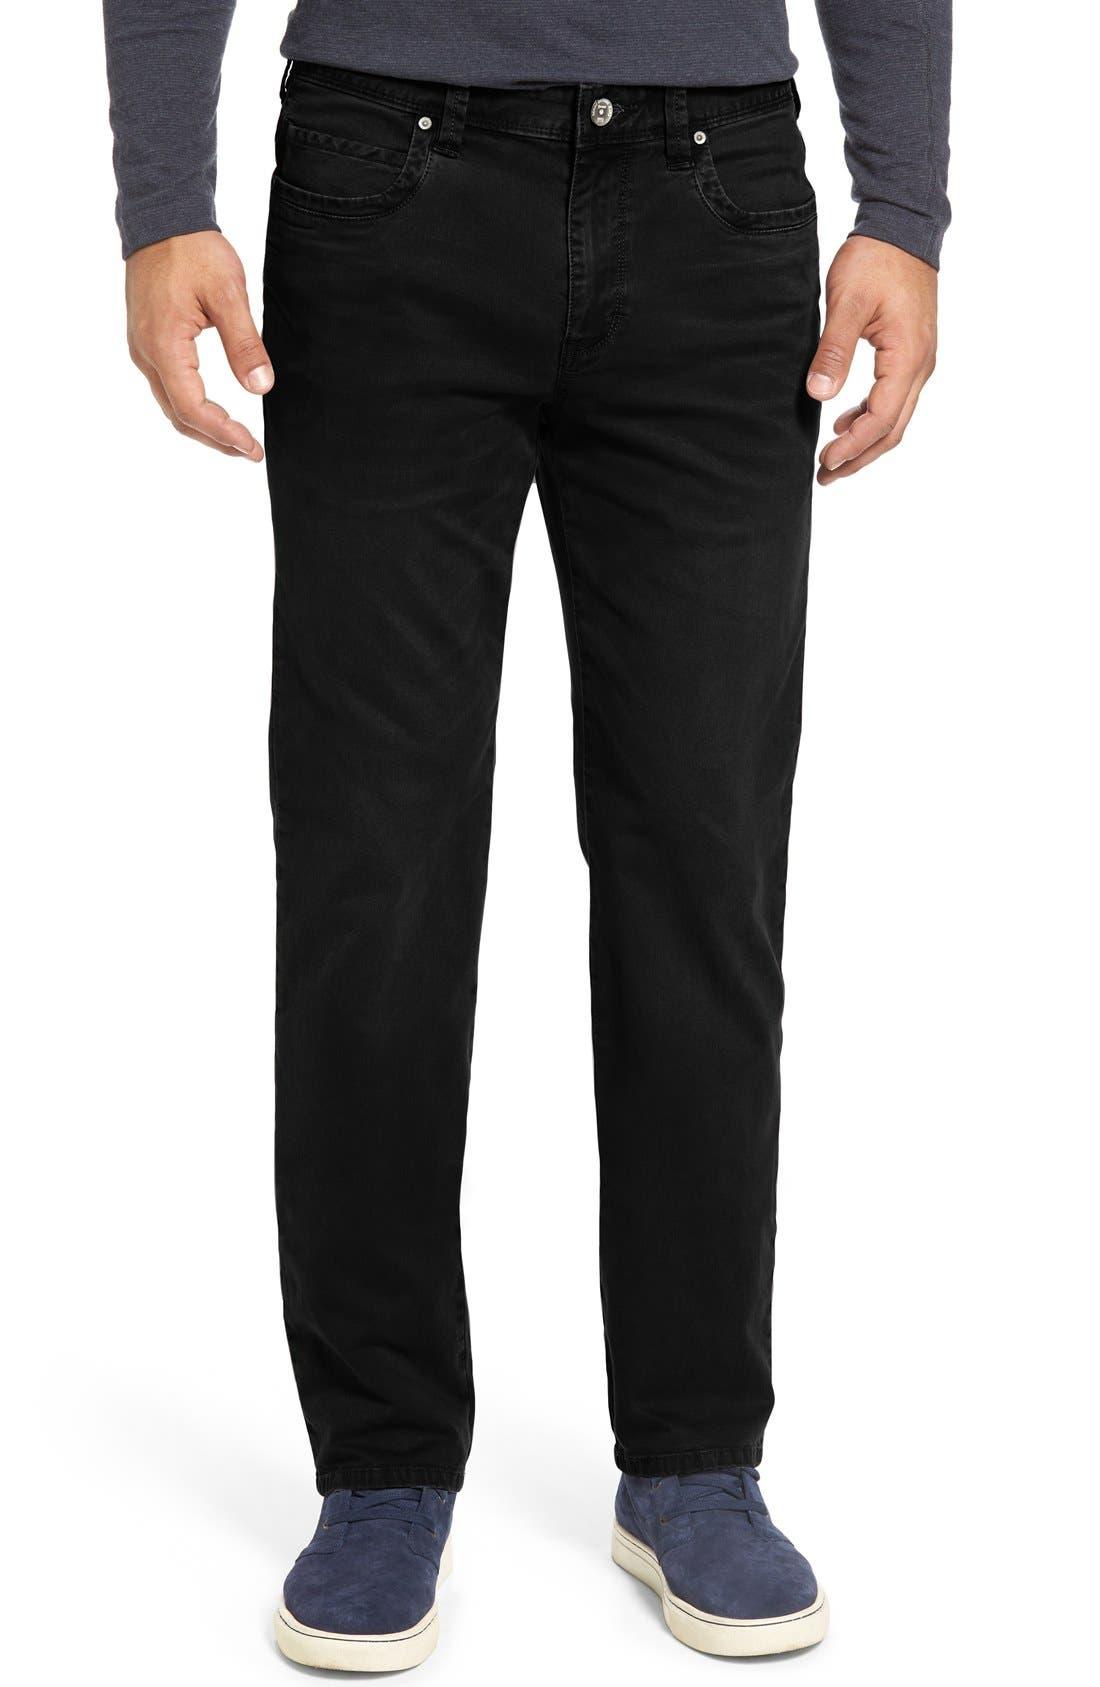 'Santiago' Washed Twill Pants,                             Main thumbnail 1, color,                             Black